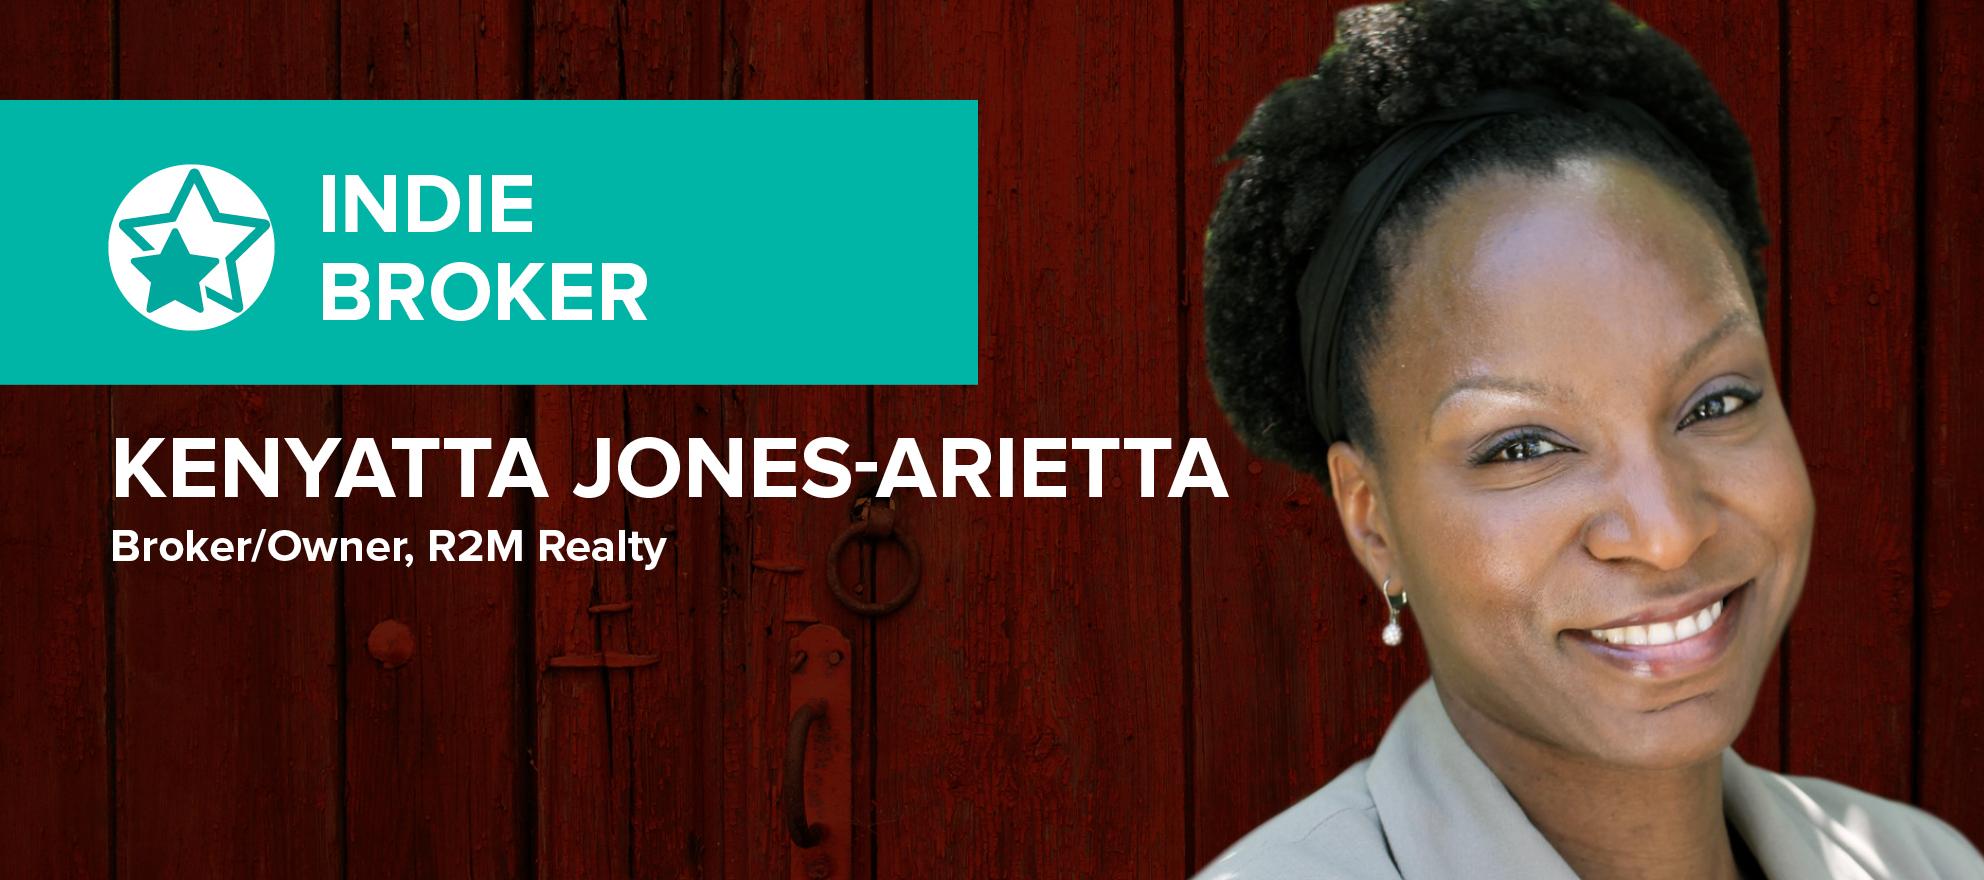 Kenyatta Jones-Arietta: 'The biggest difference is me'